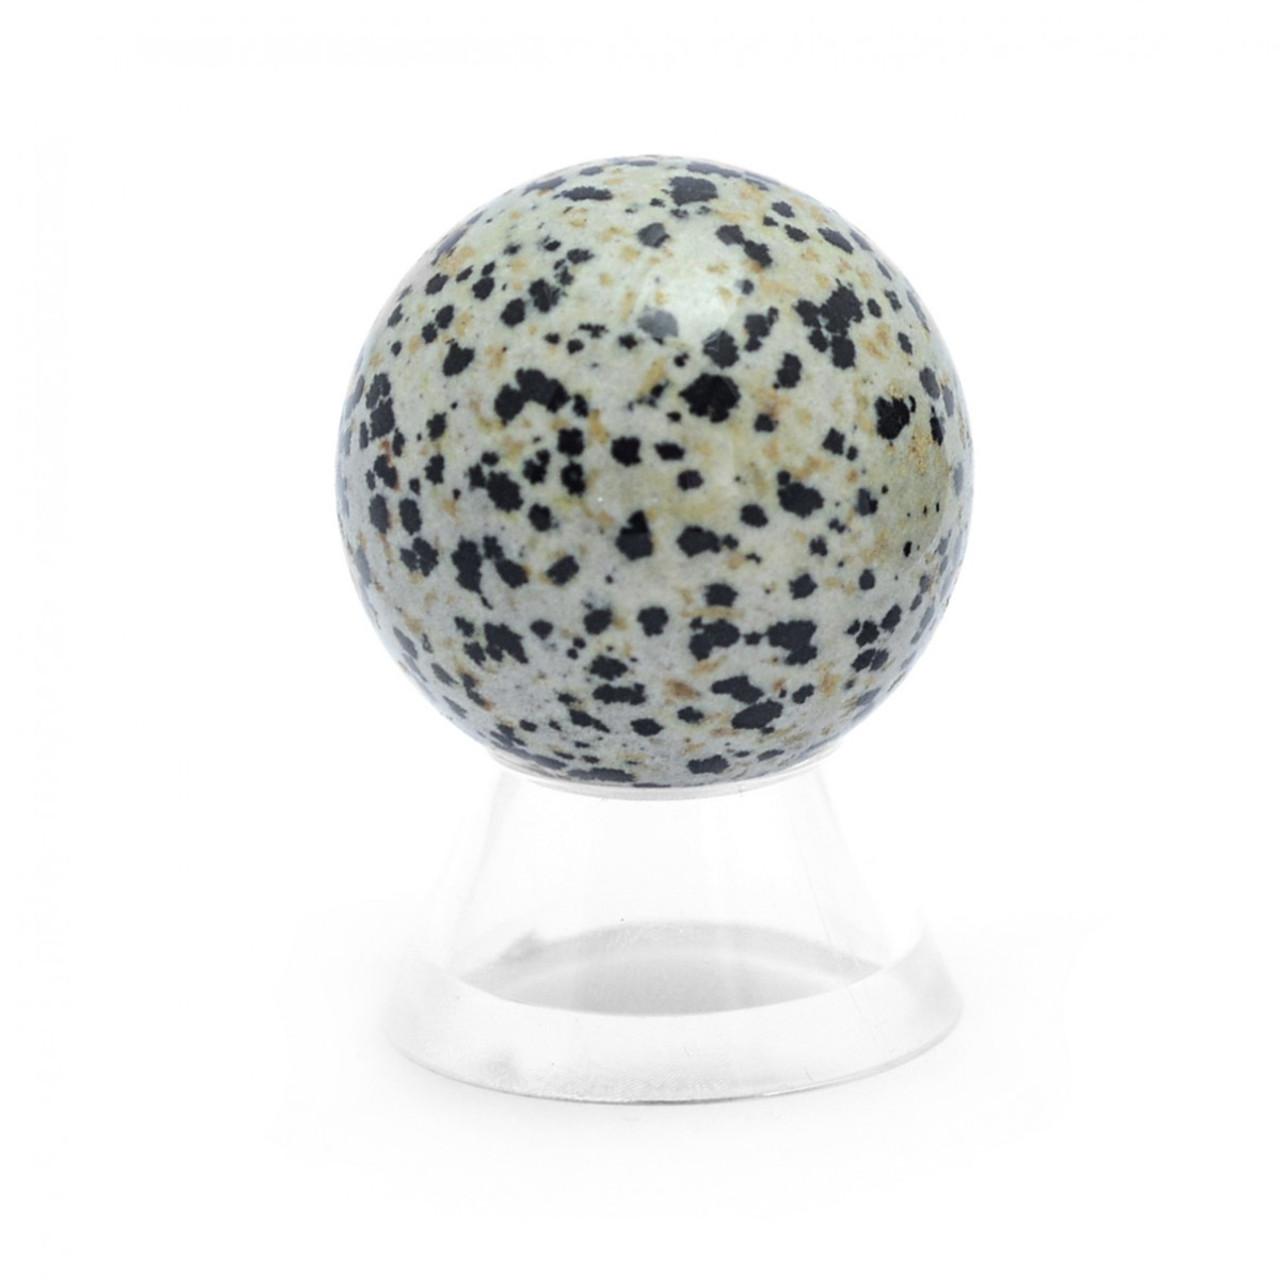 Dalmation Jasper Crystal Sphere (35mm)